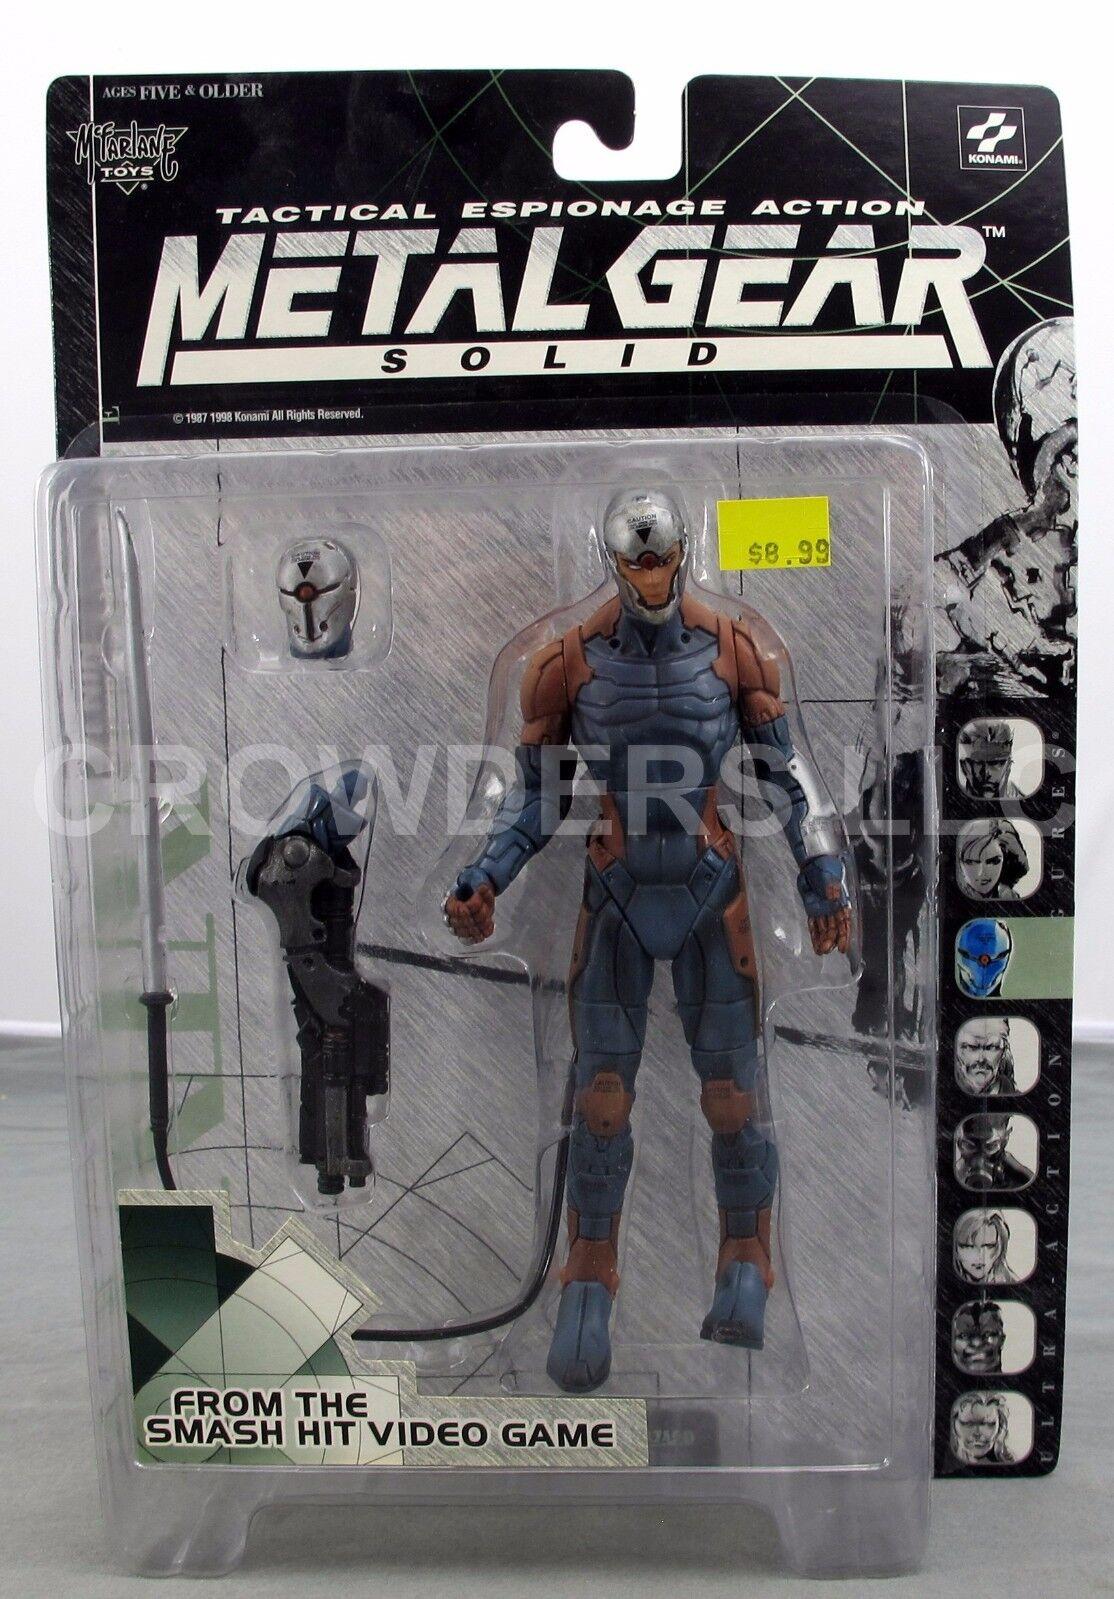 Metal Gear Solid Tactical Espionage Action 6